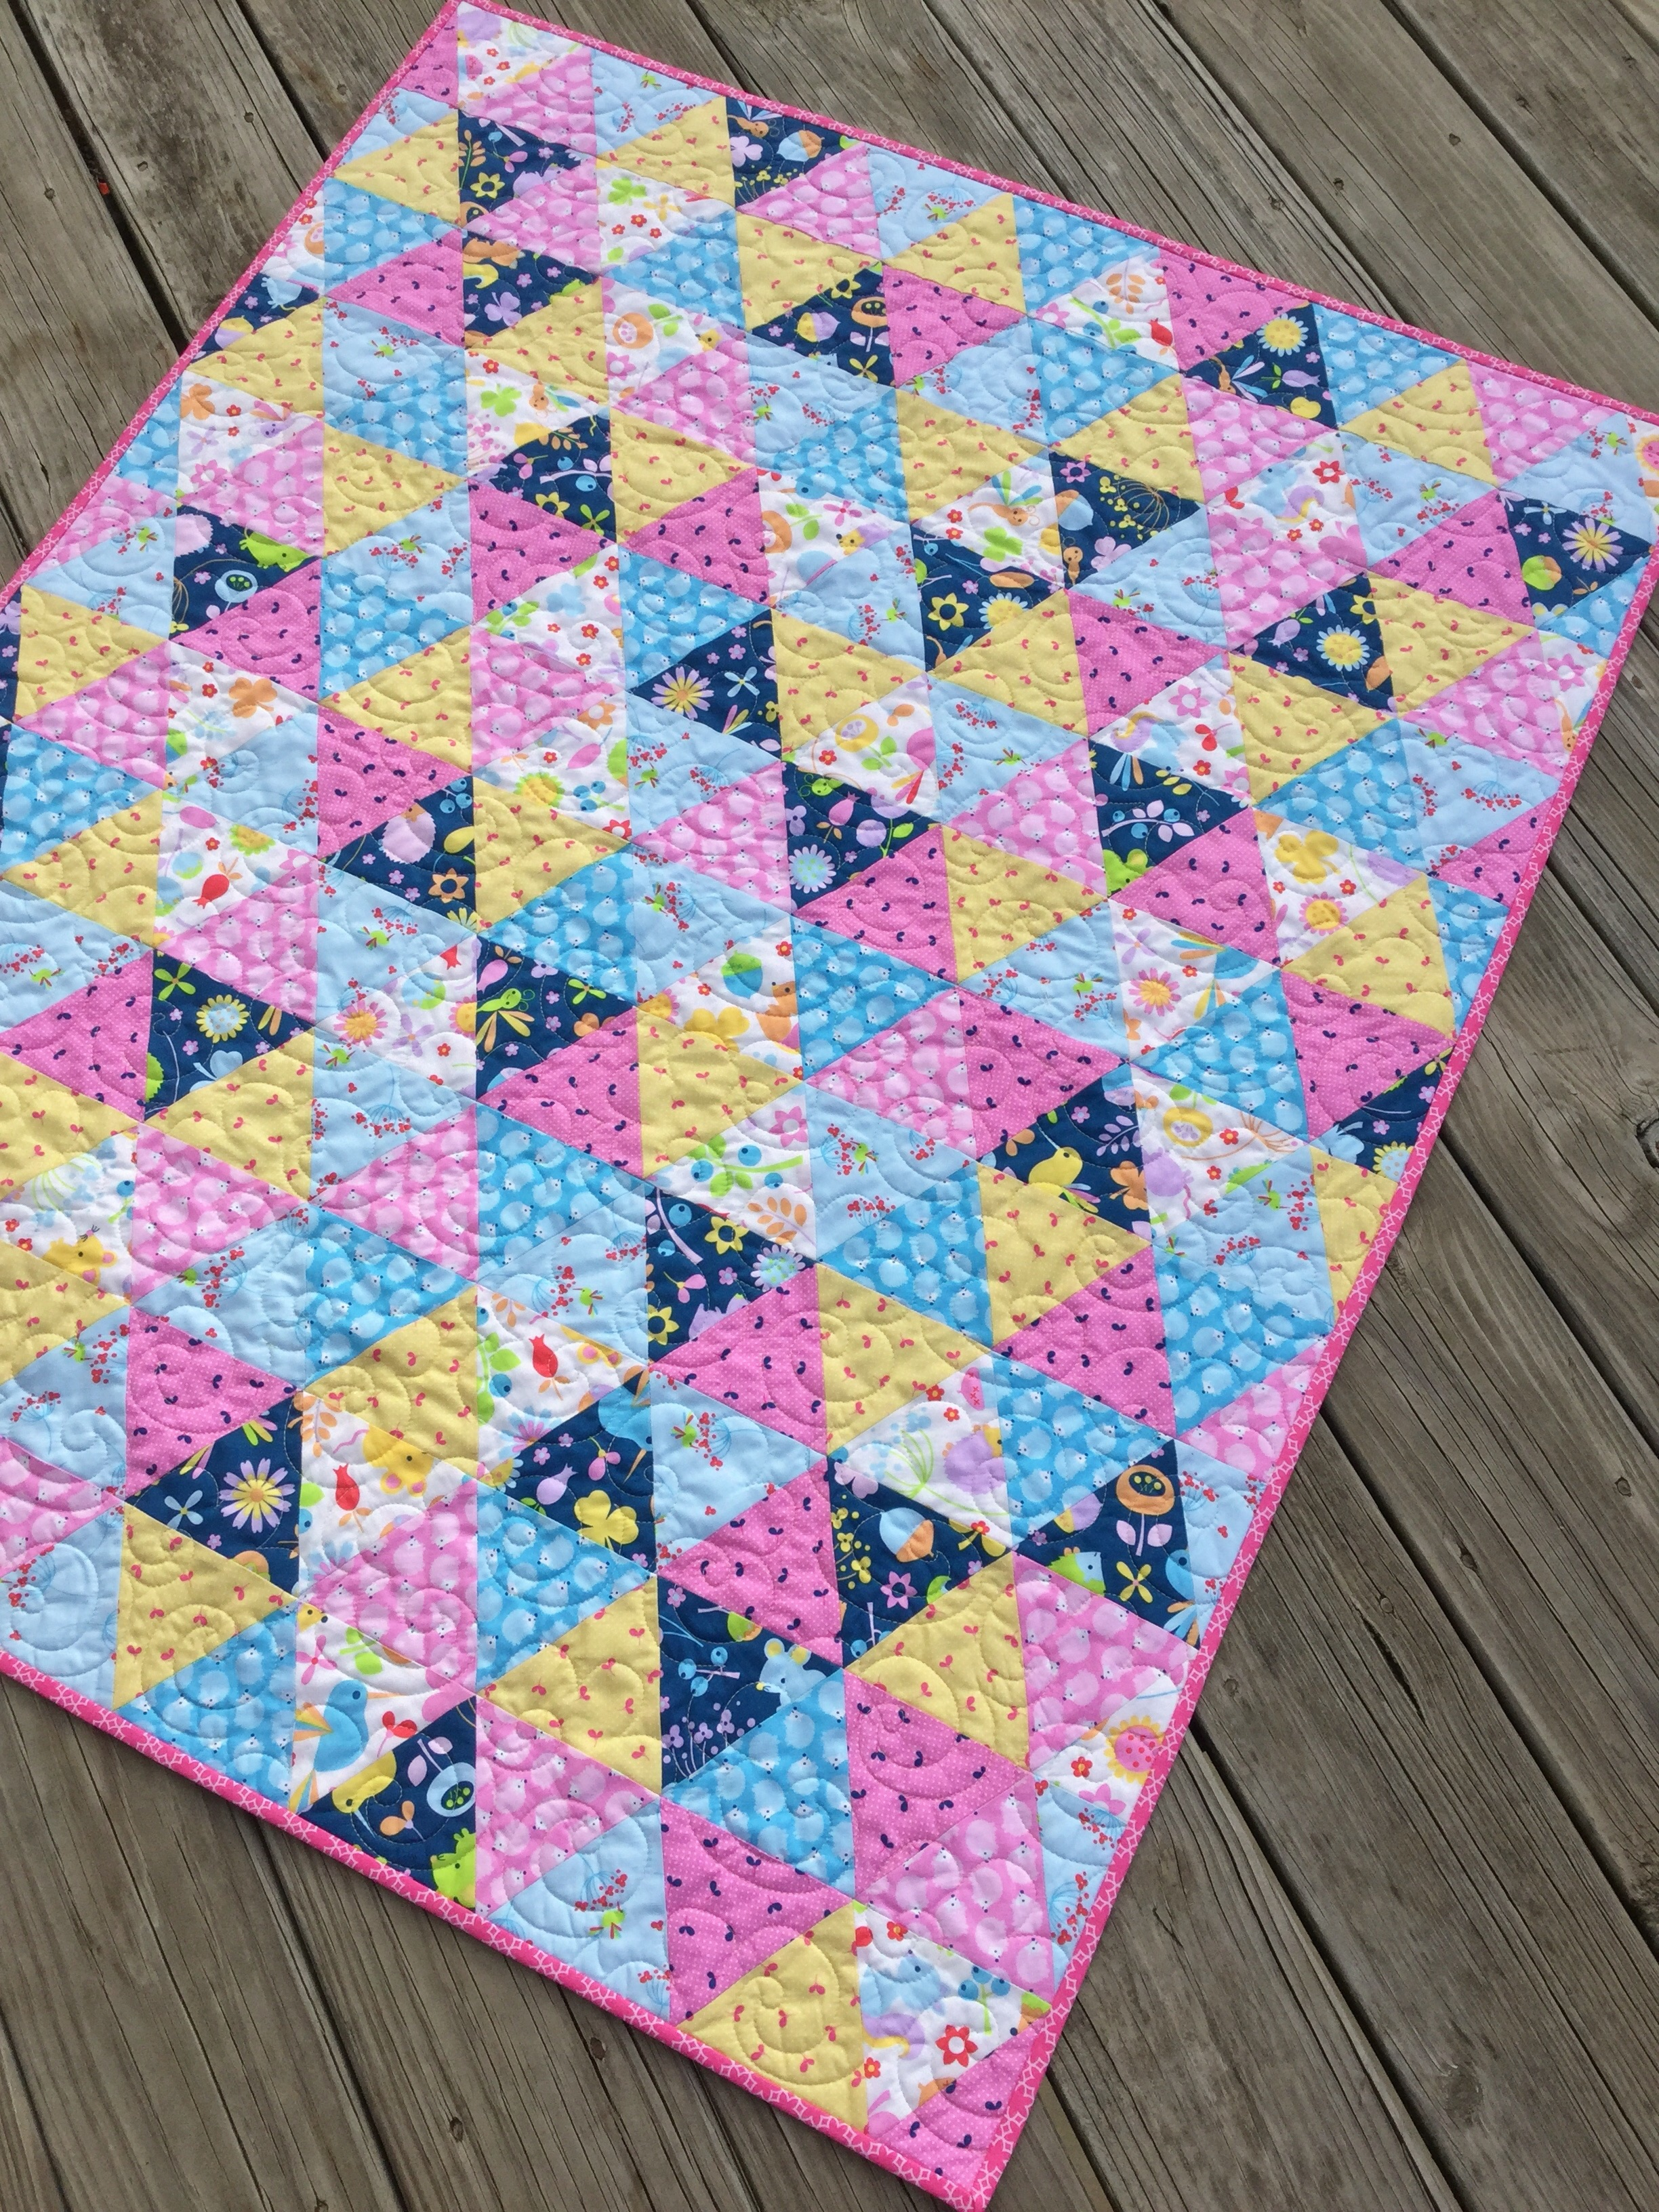 DIY baby quilt kits | SewMod : baby quilt kits to make - Adamdwight.com